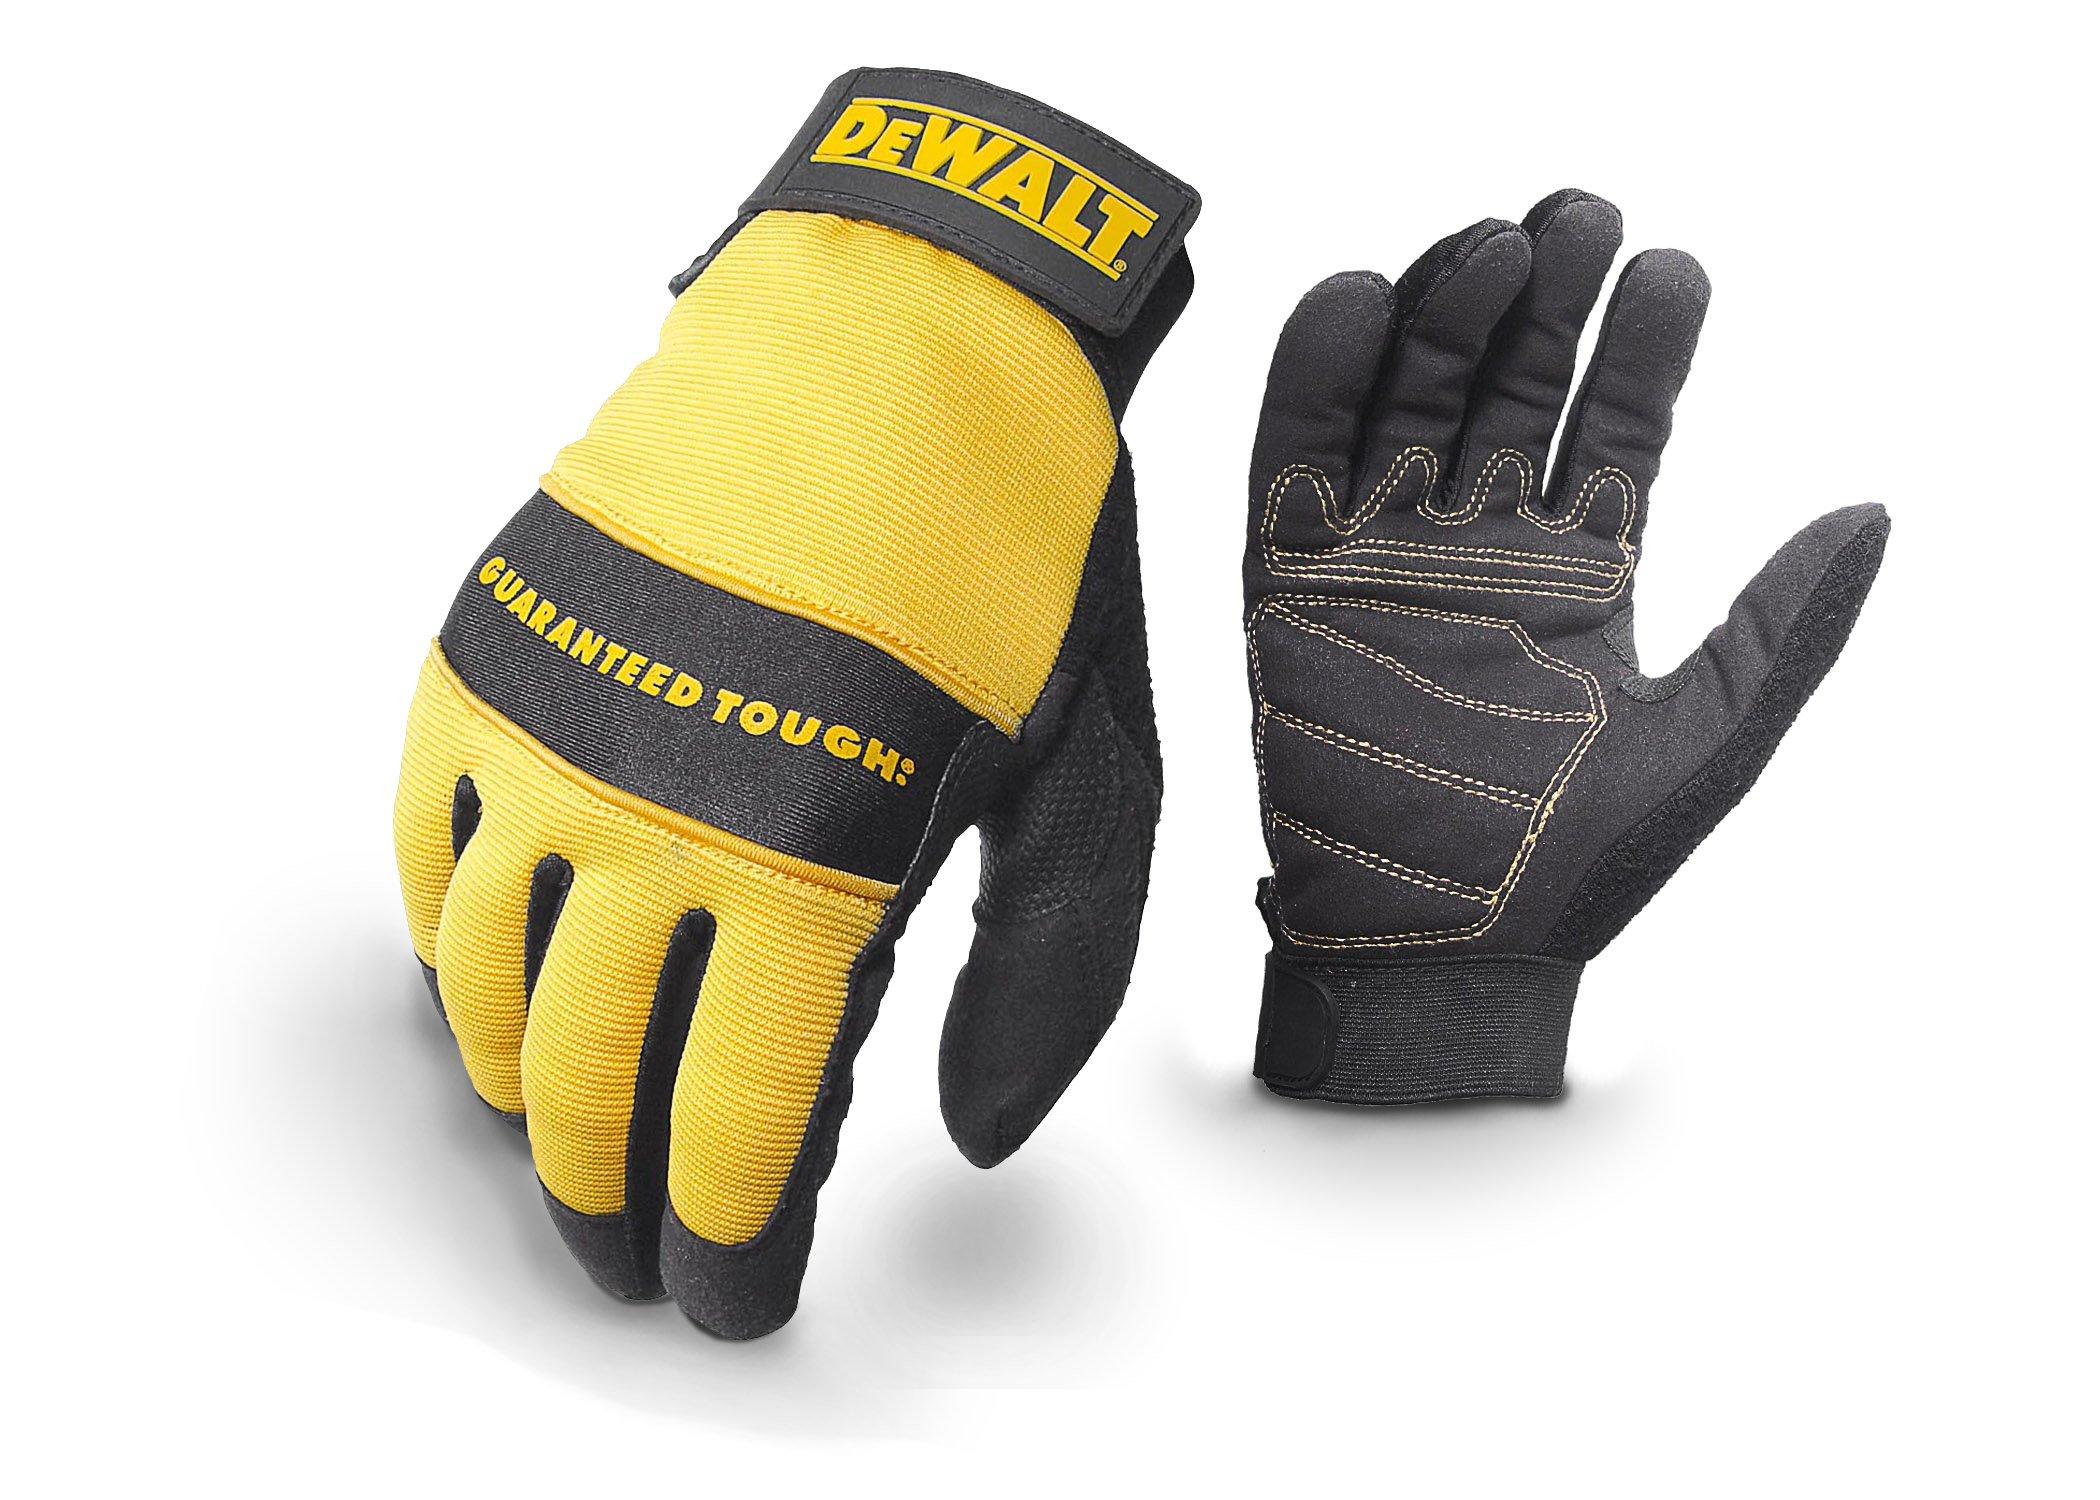 Dewalt DPG20L All Purpose Synthetic Leather Palm Spandex Back Velcro Wrist Work Glove, Large by DEWALT (Image #2)